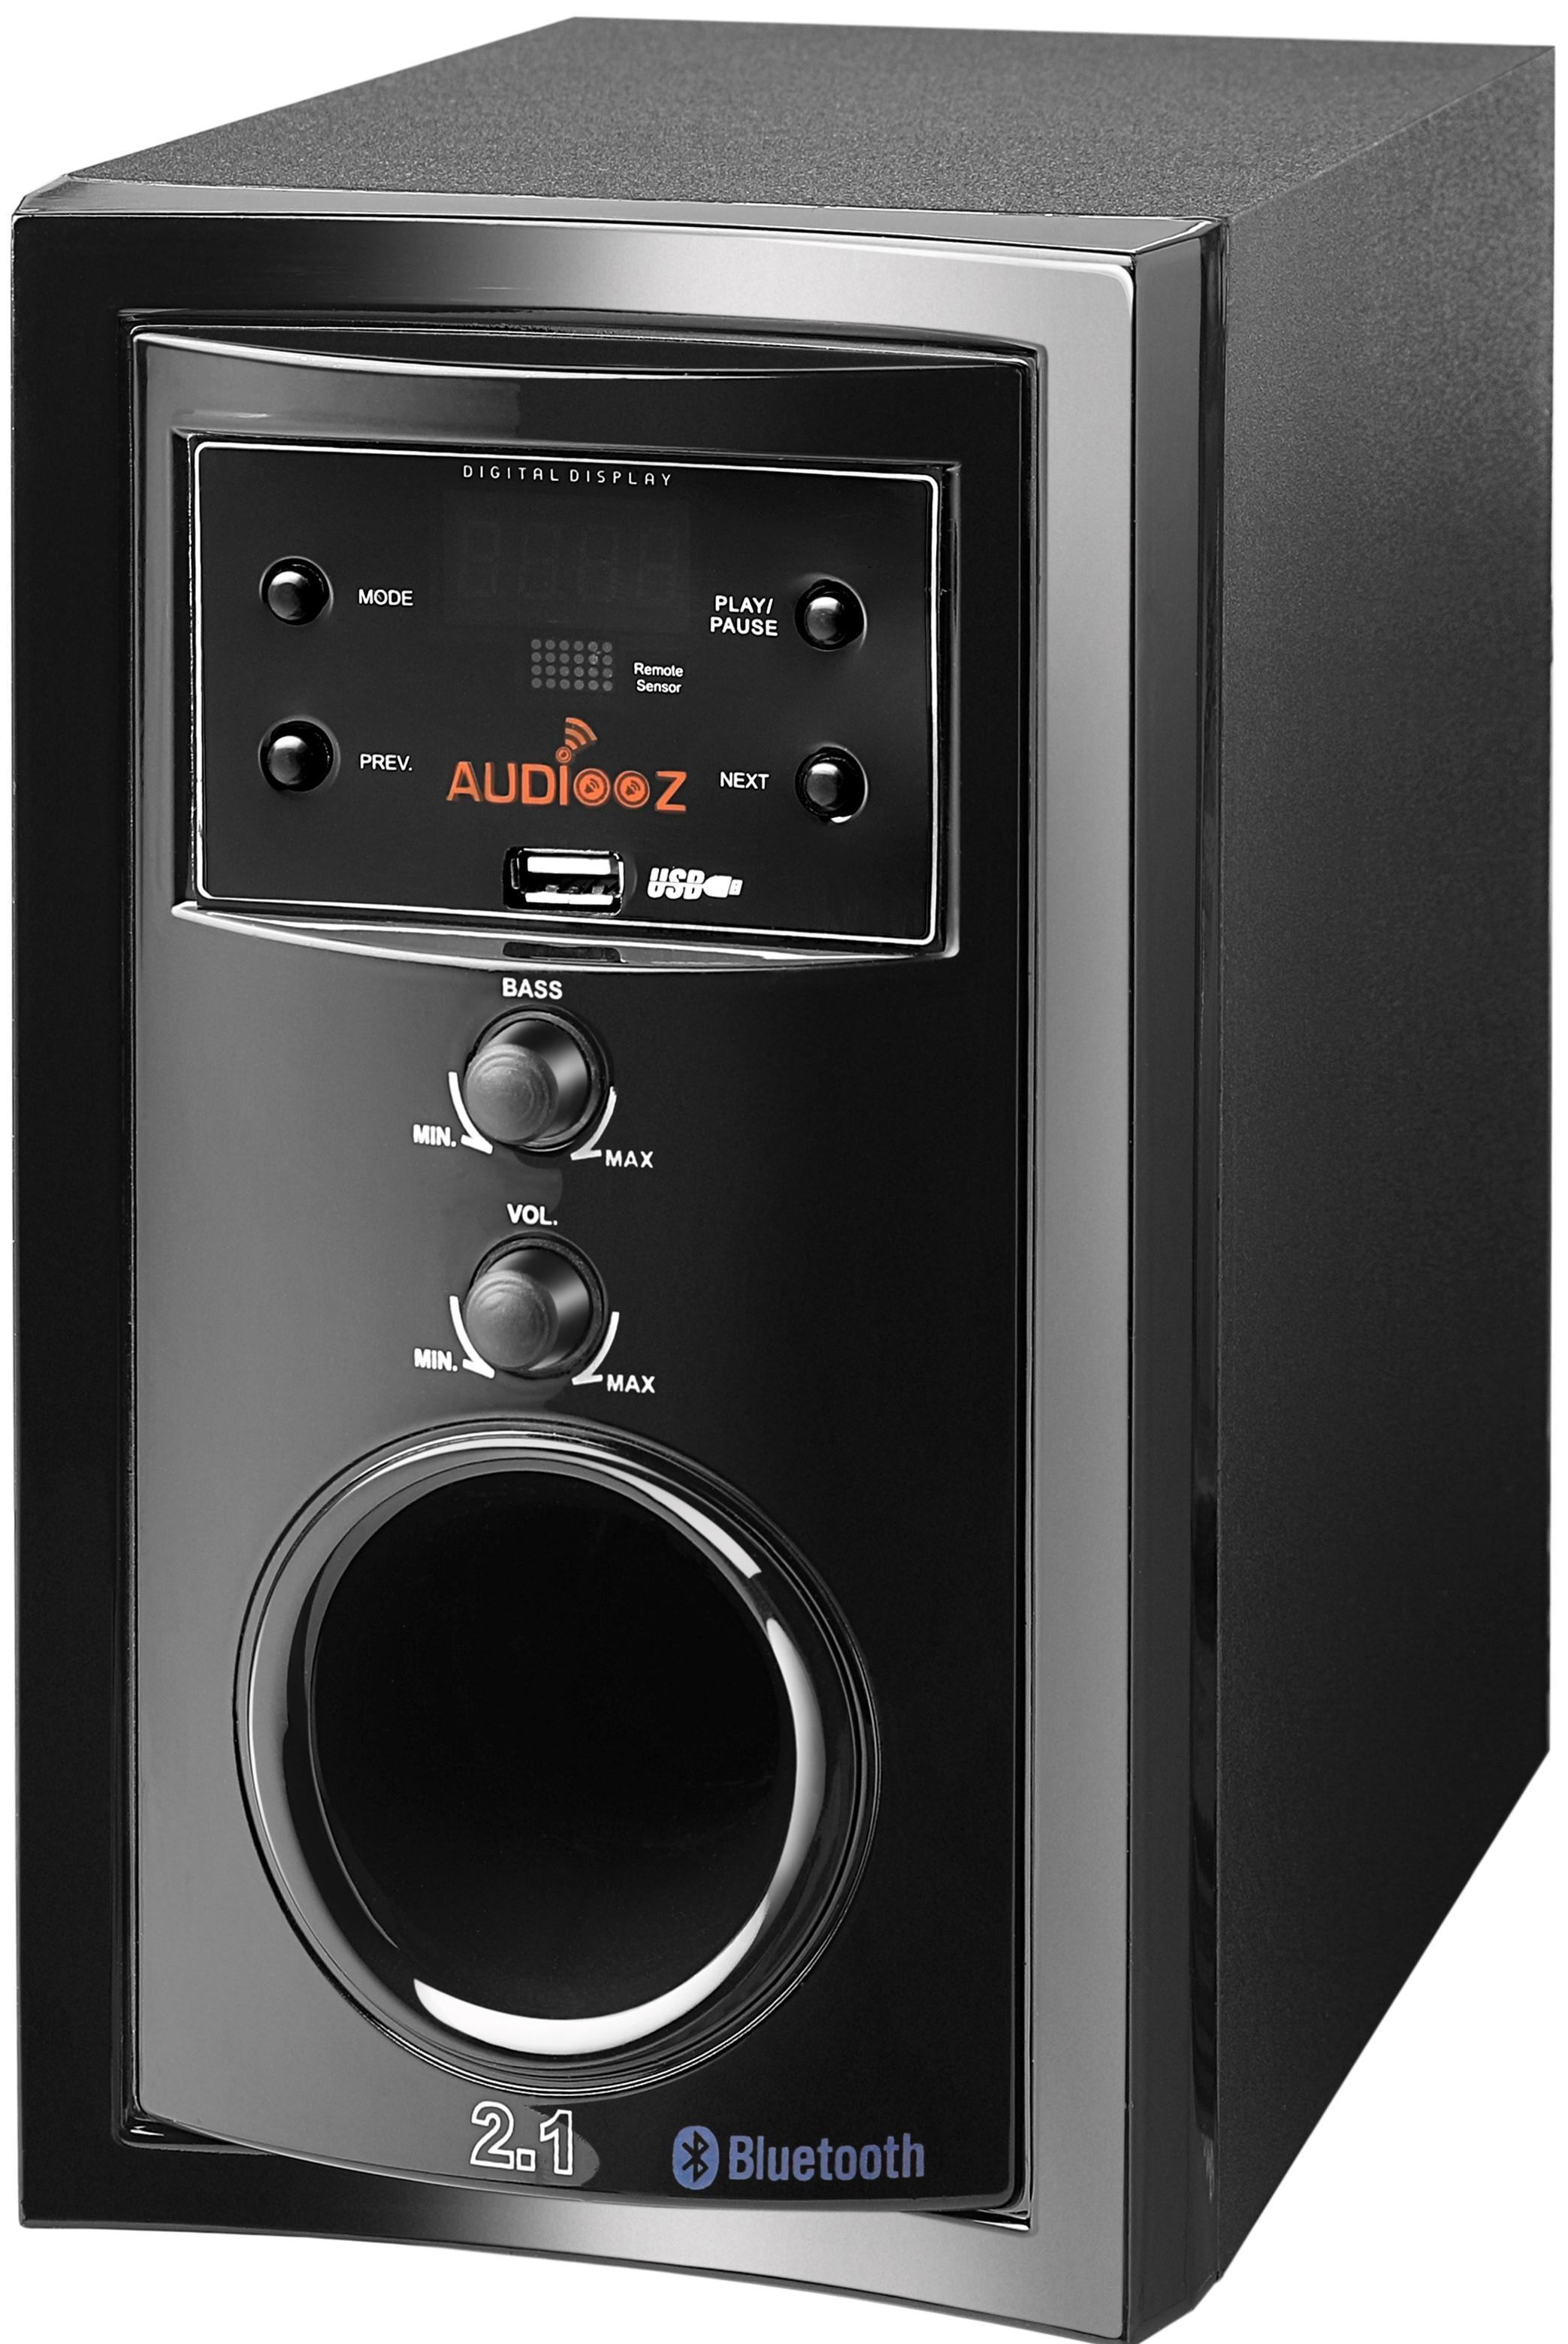 Audiooz Model - 6969